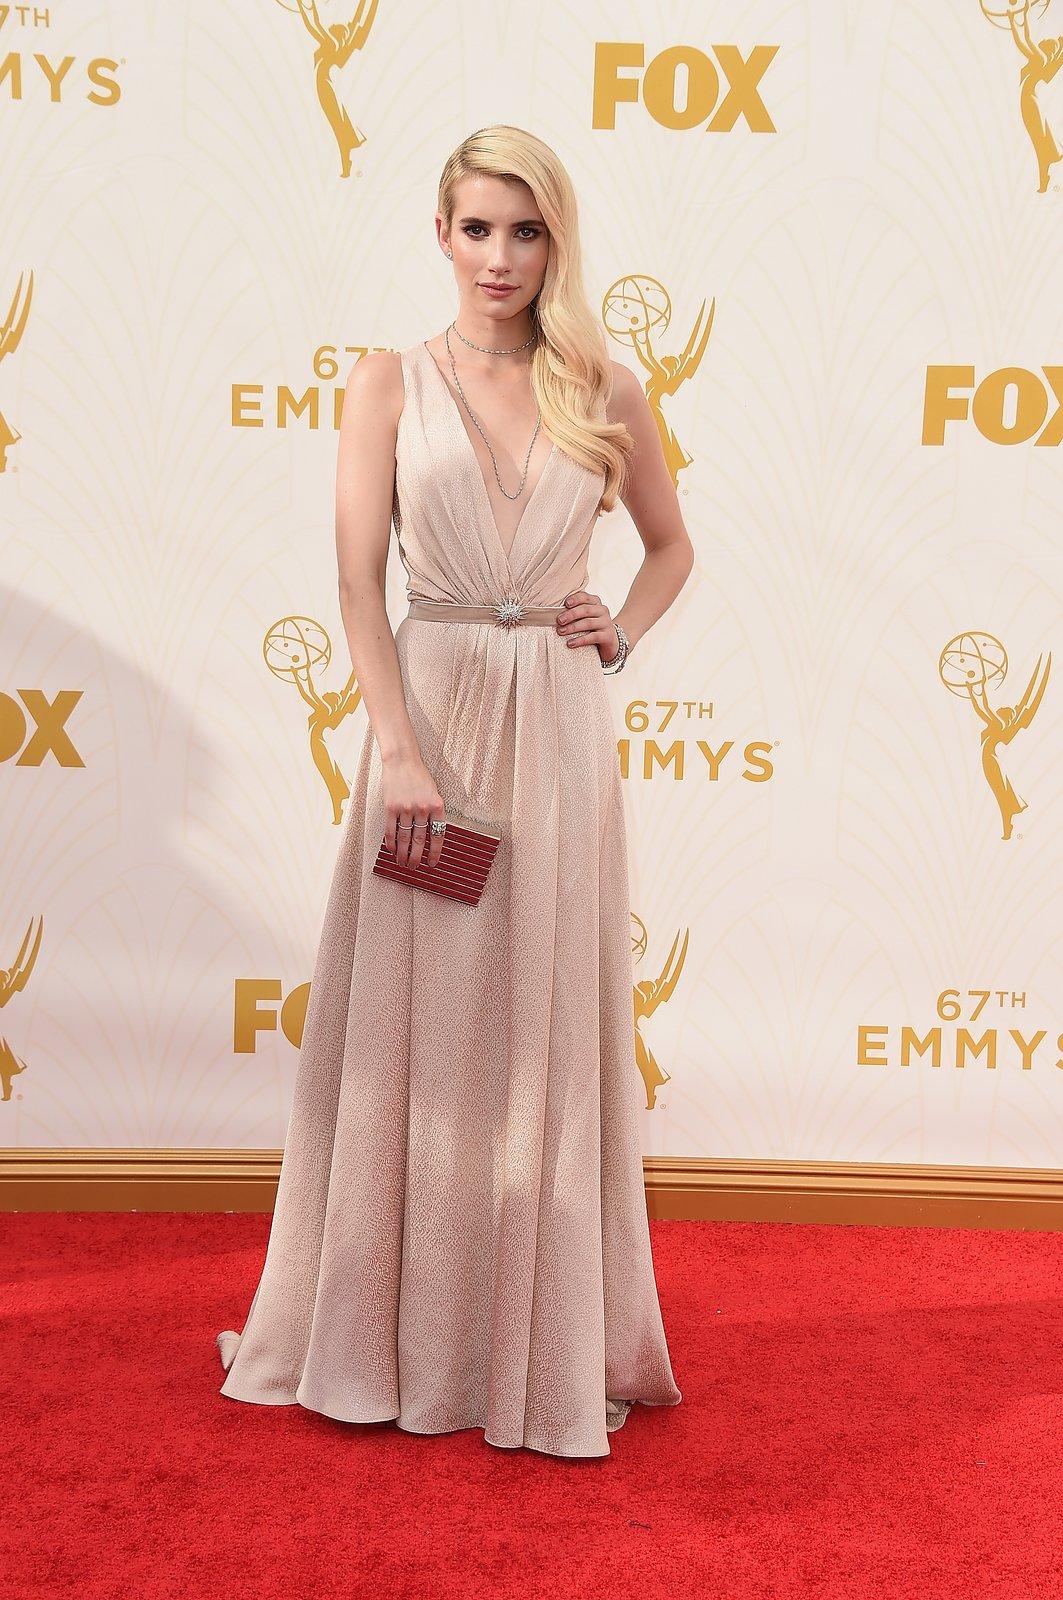 emma-roberts-emmys-red-carpet-2015.jpg